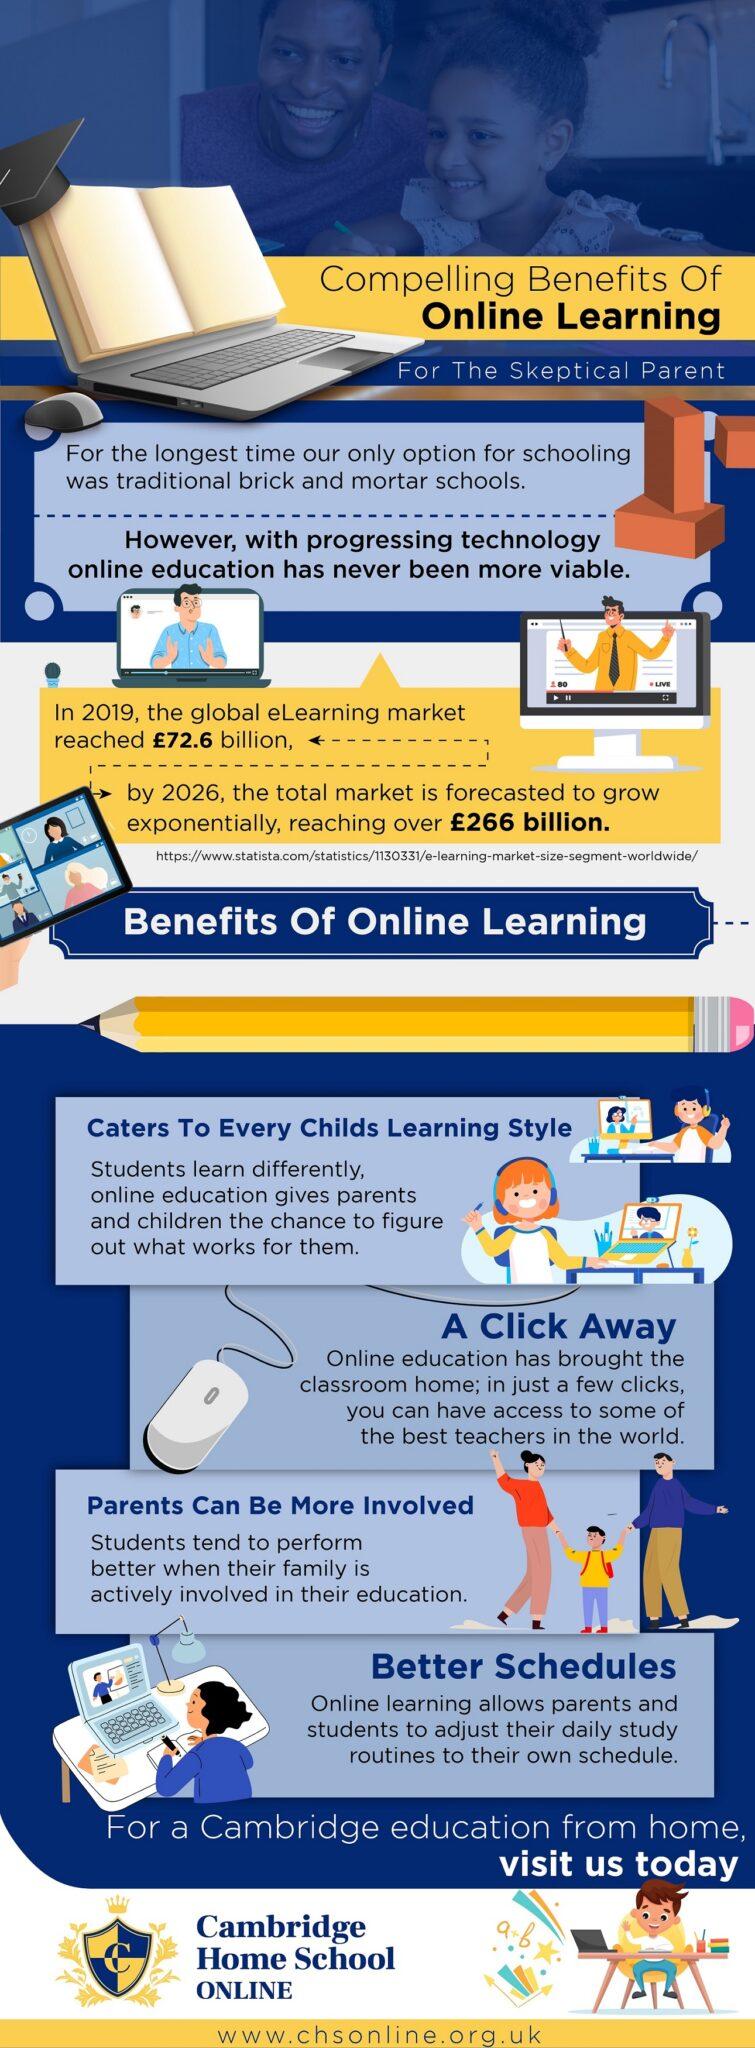 Compelling benefits of online learning for skeptical parents